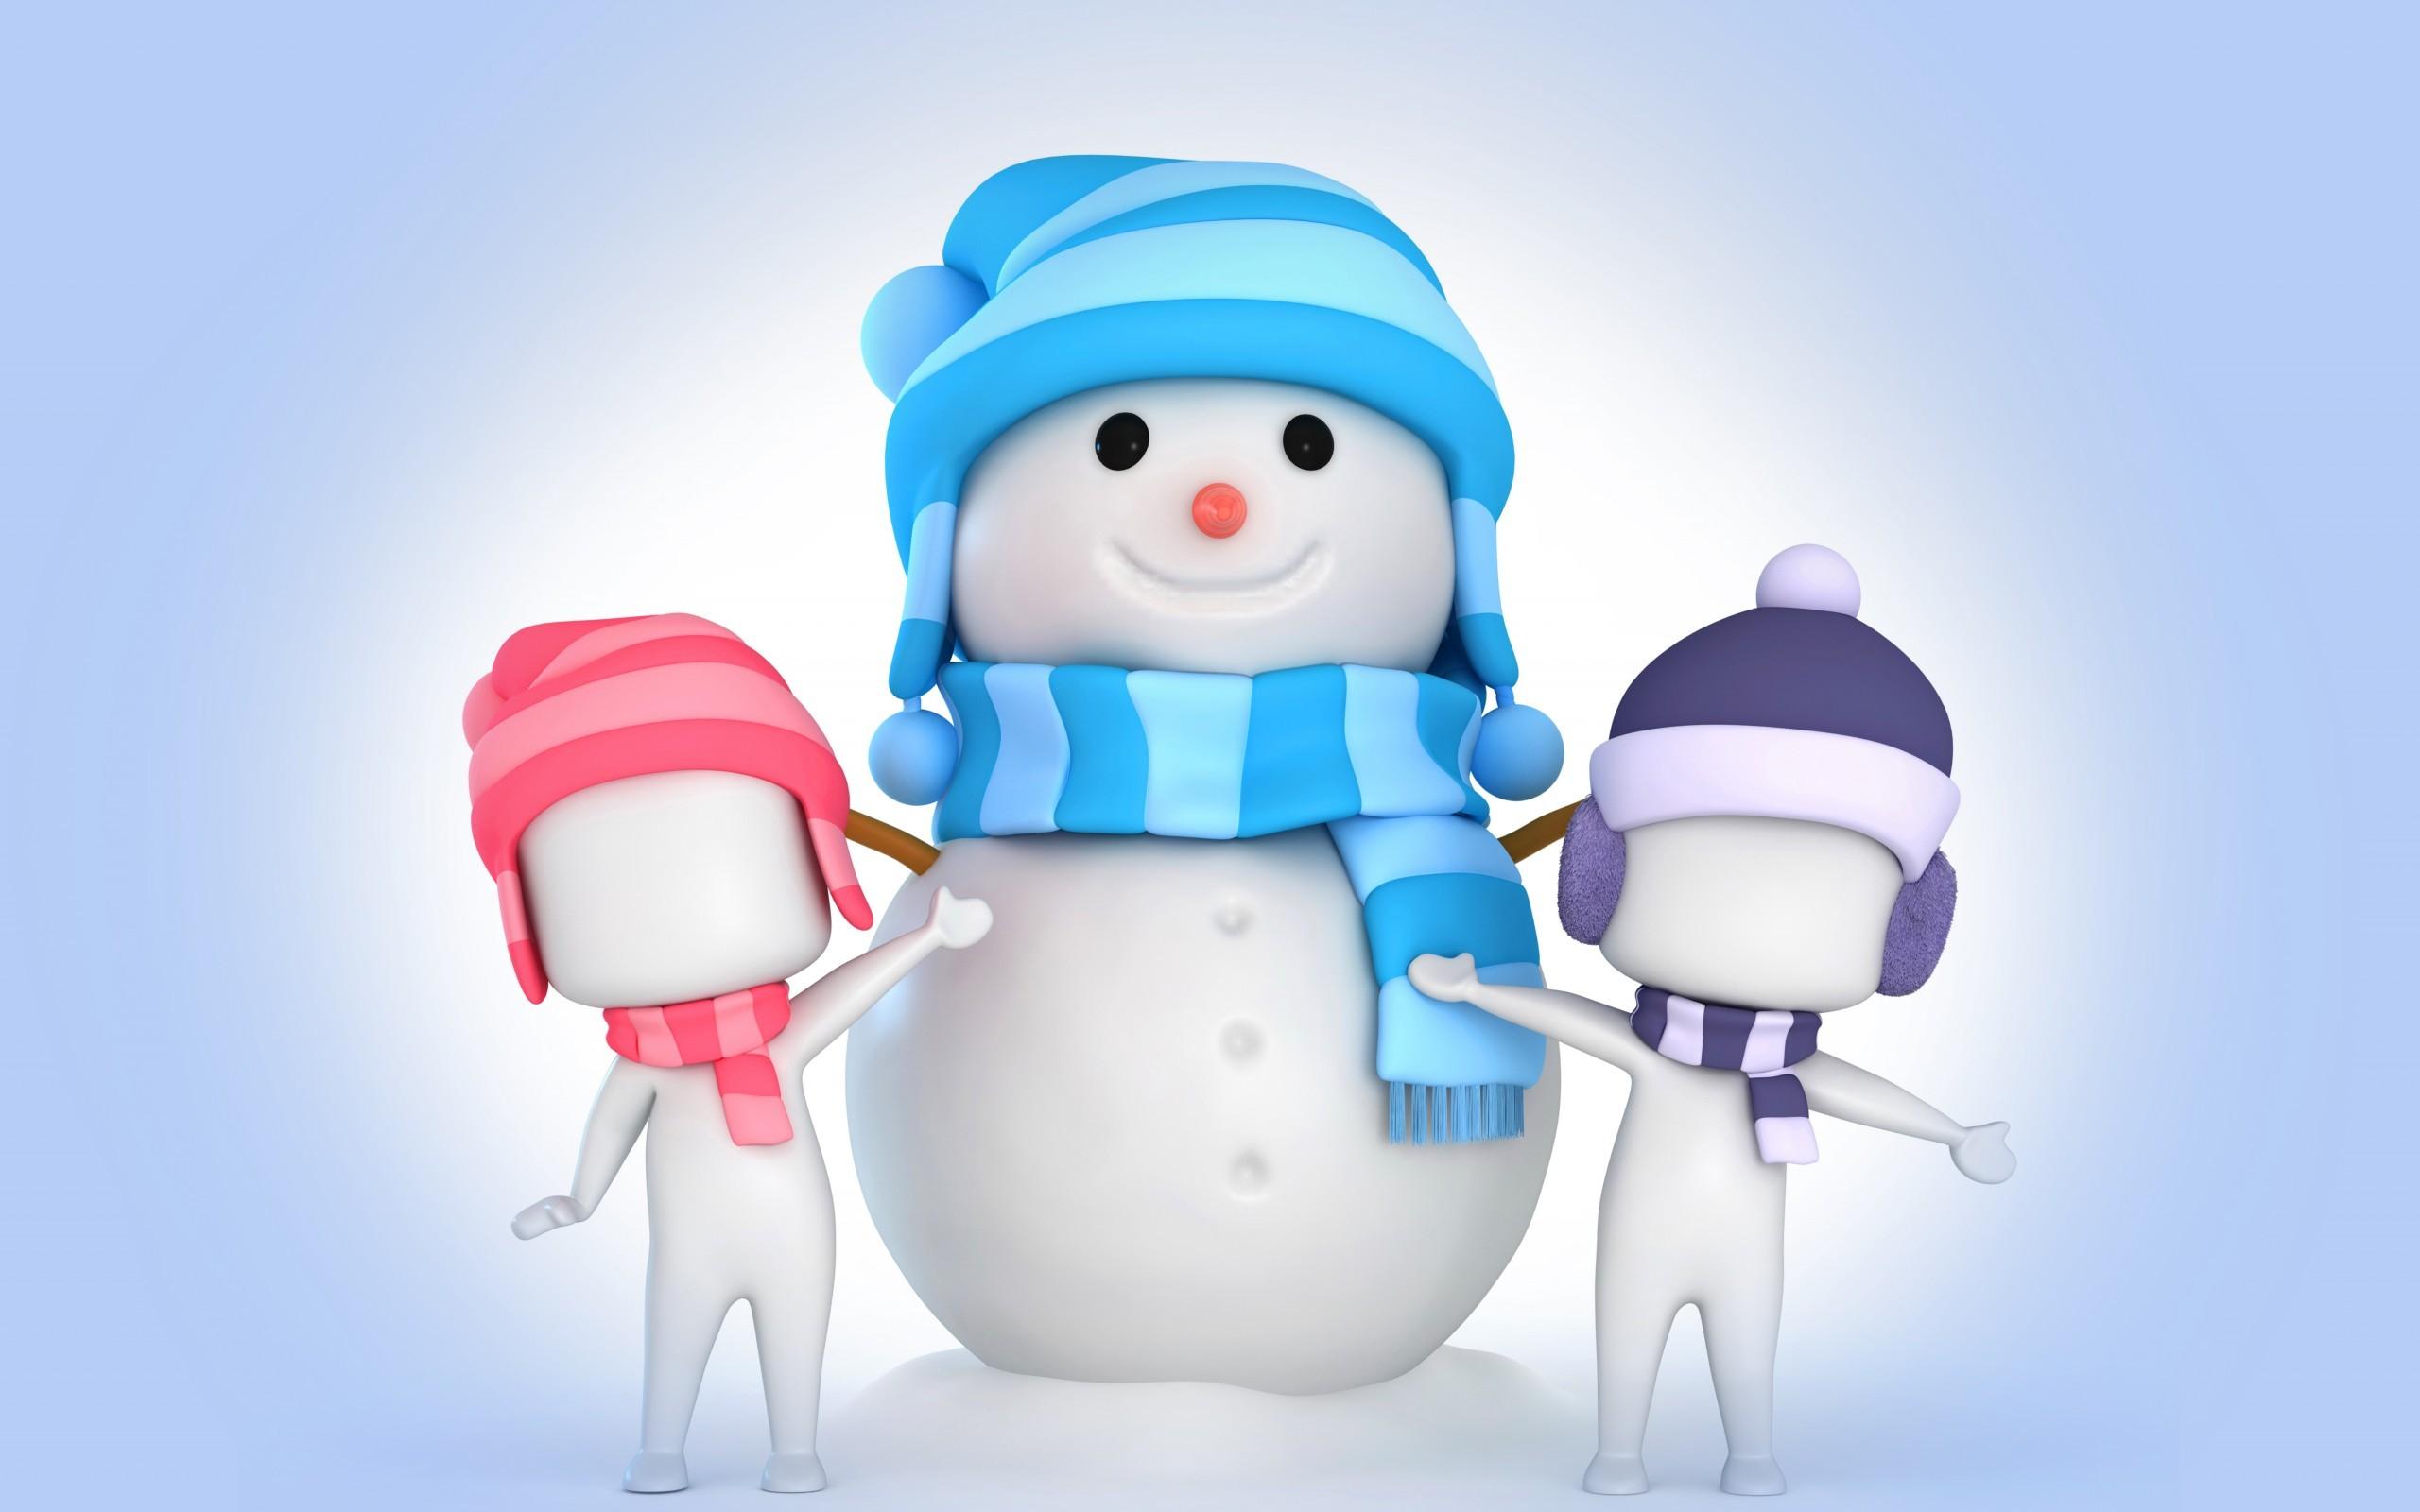 Wallpaper Ilustrasi Gambar Kartun Orang Orangan Salju